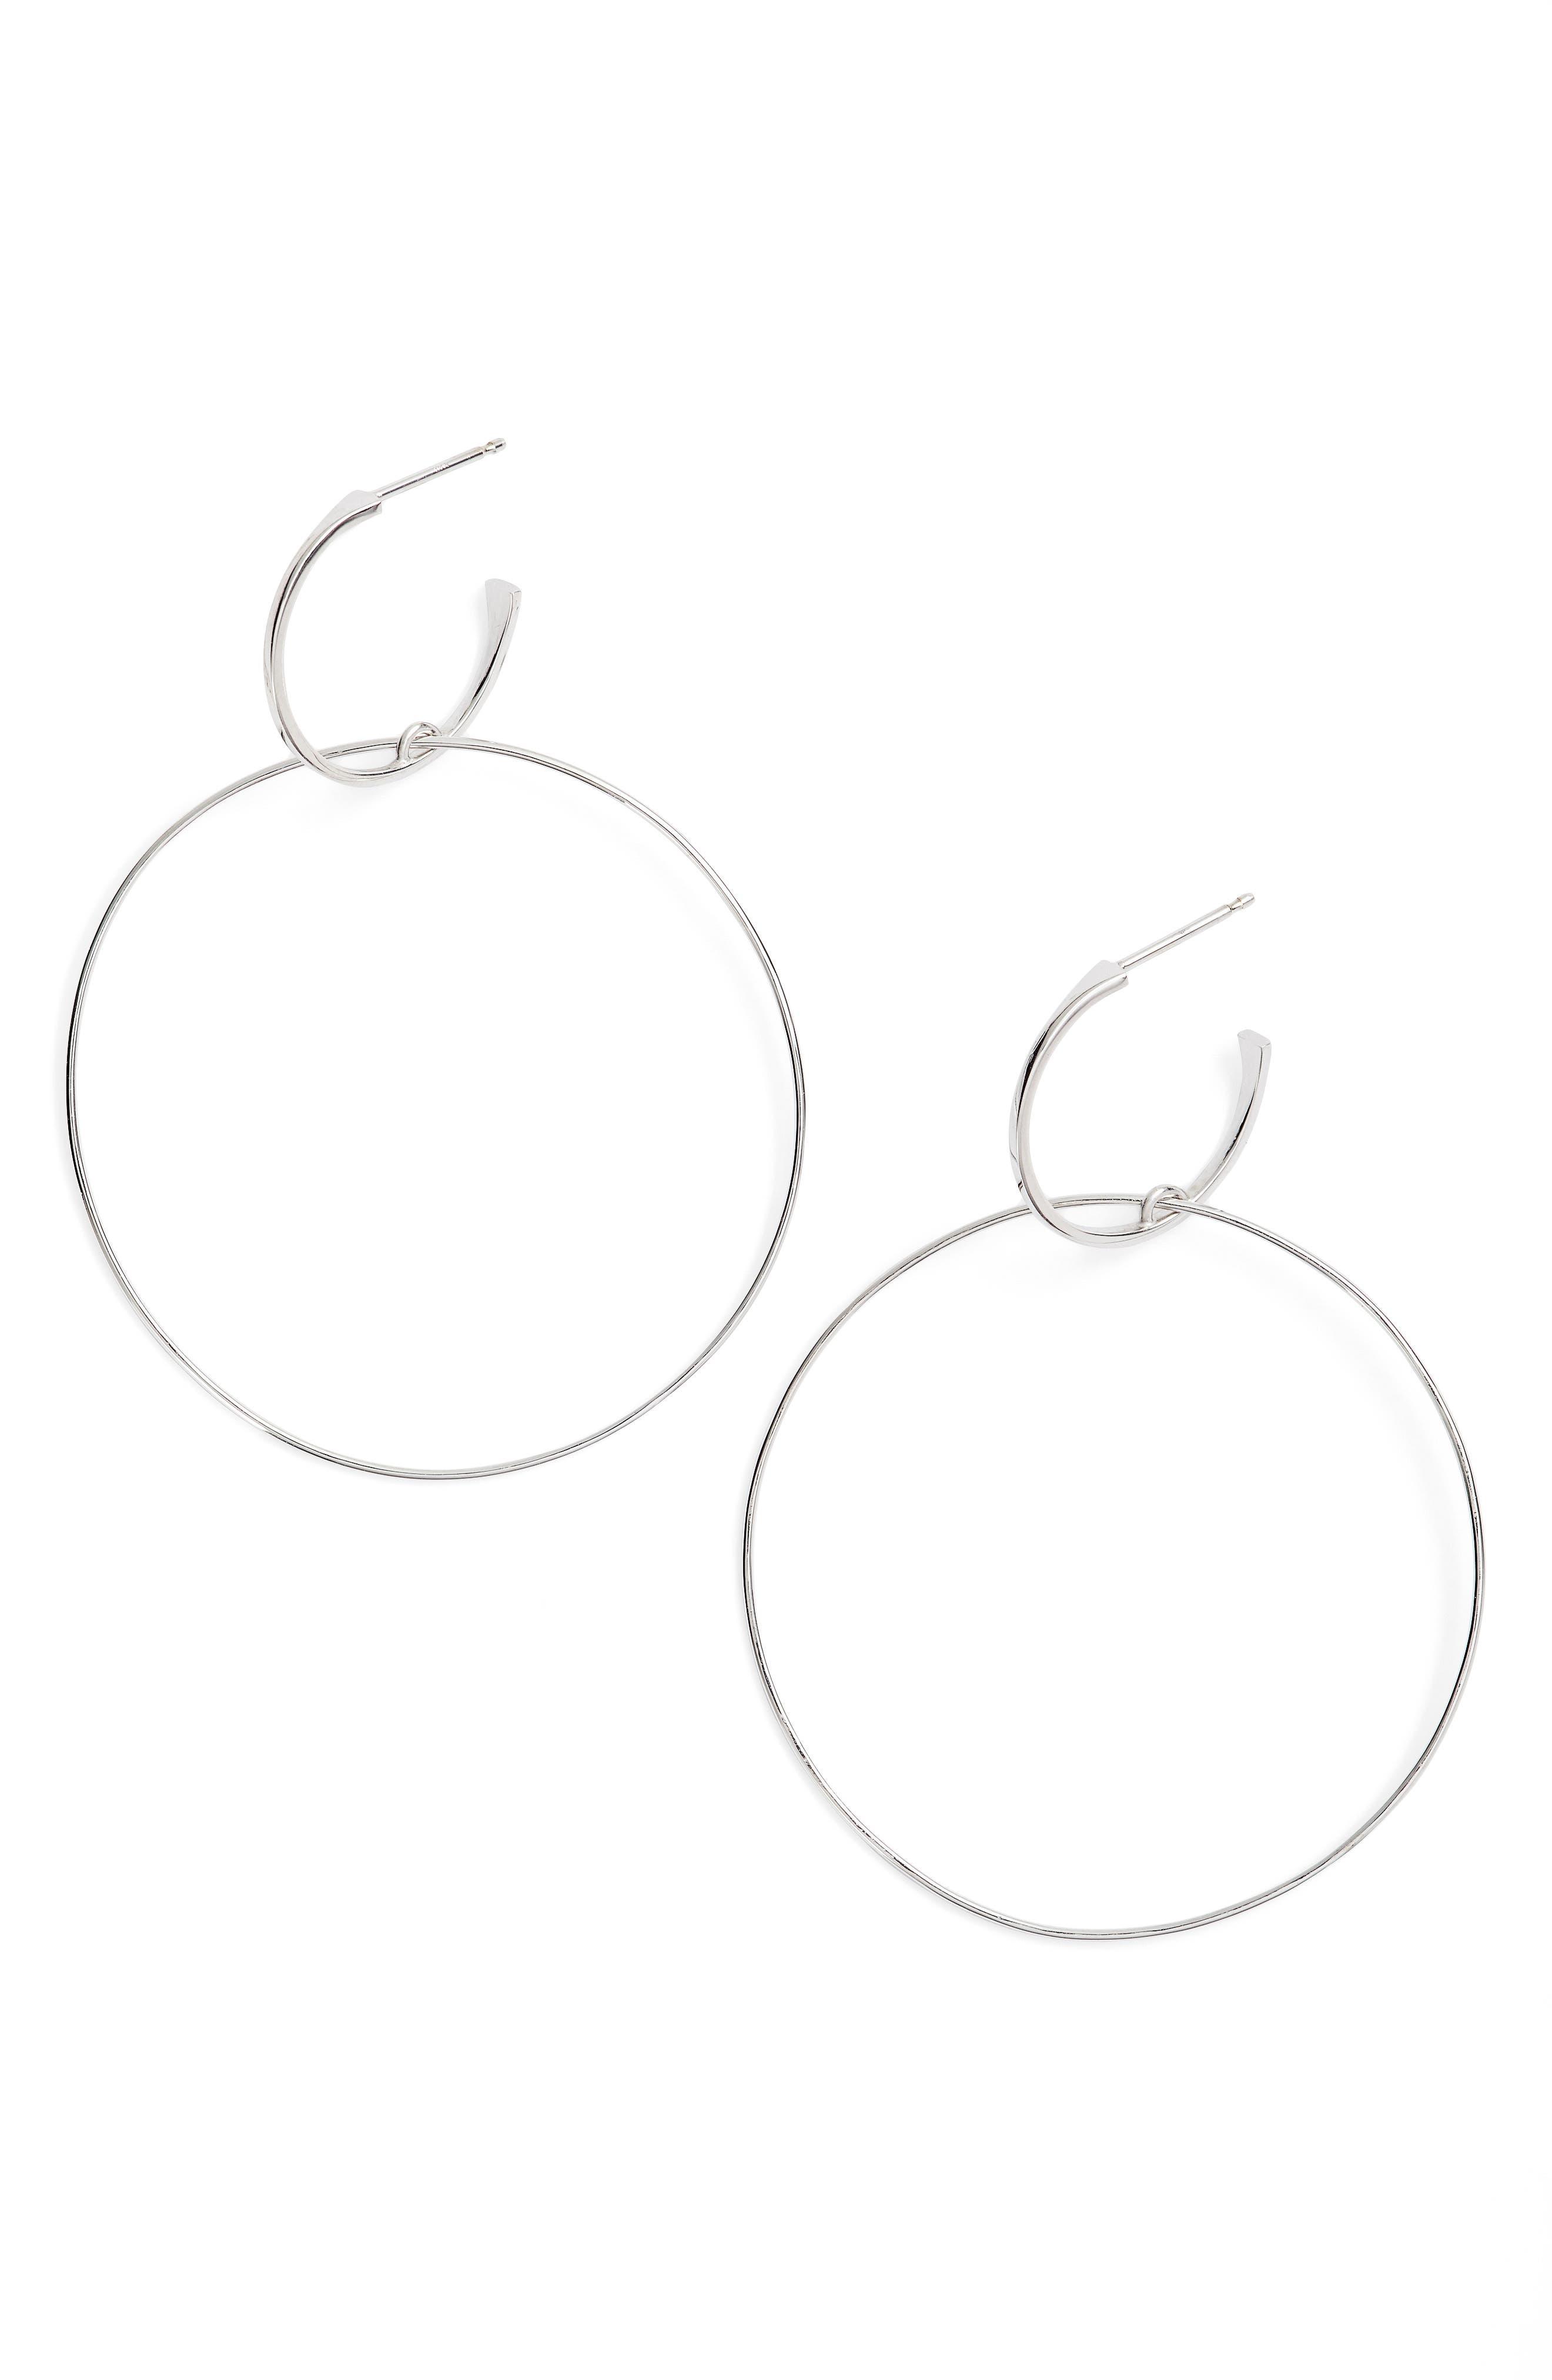 Alternate Image 1 Selected - Lana Jewelry Bond Small Double Hoop Earrings